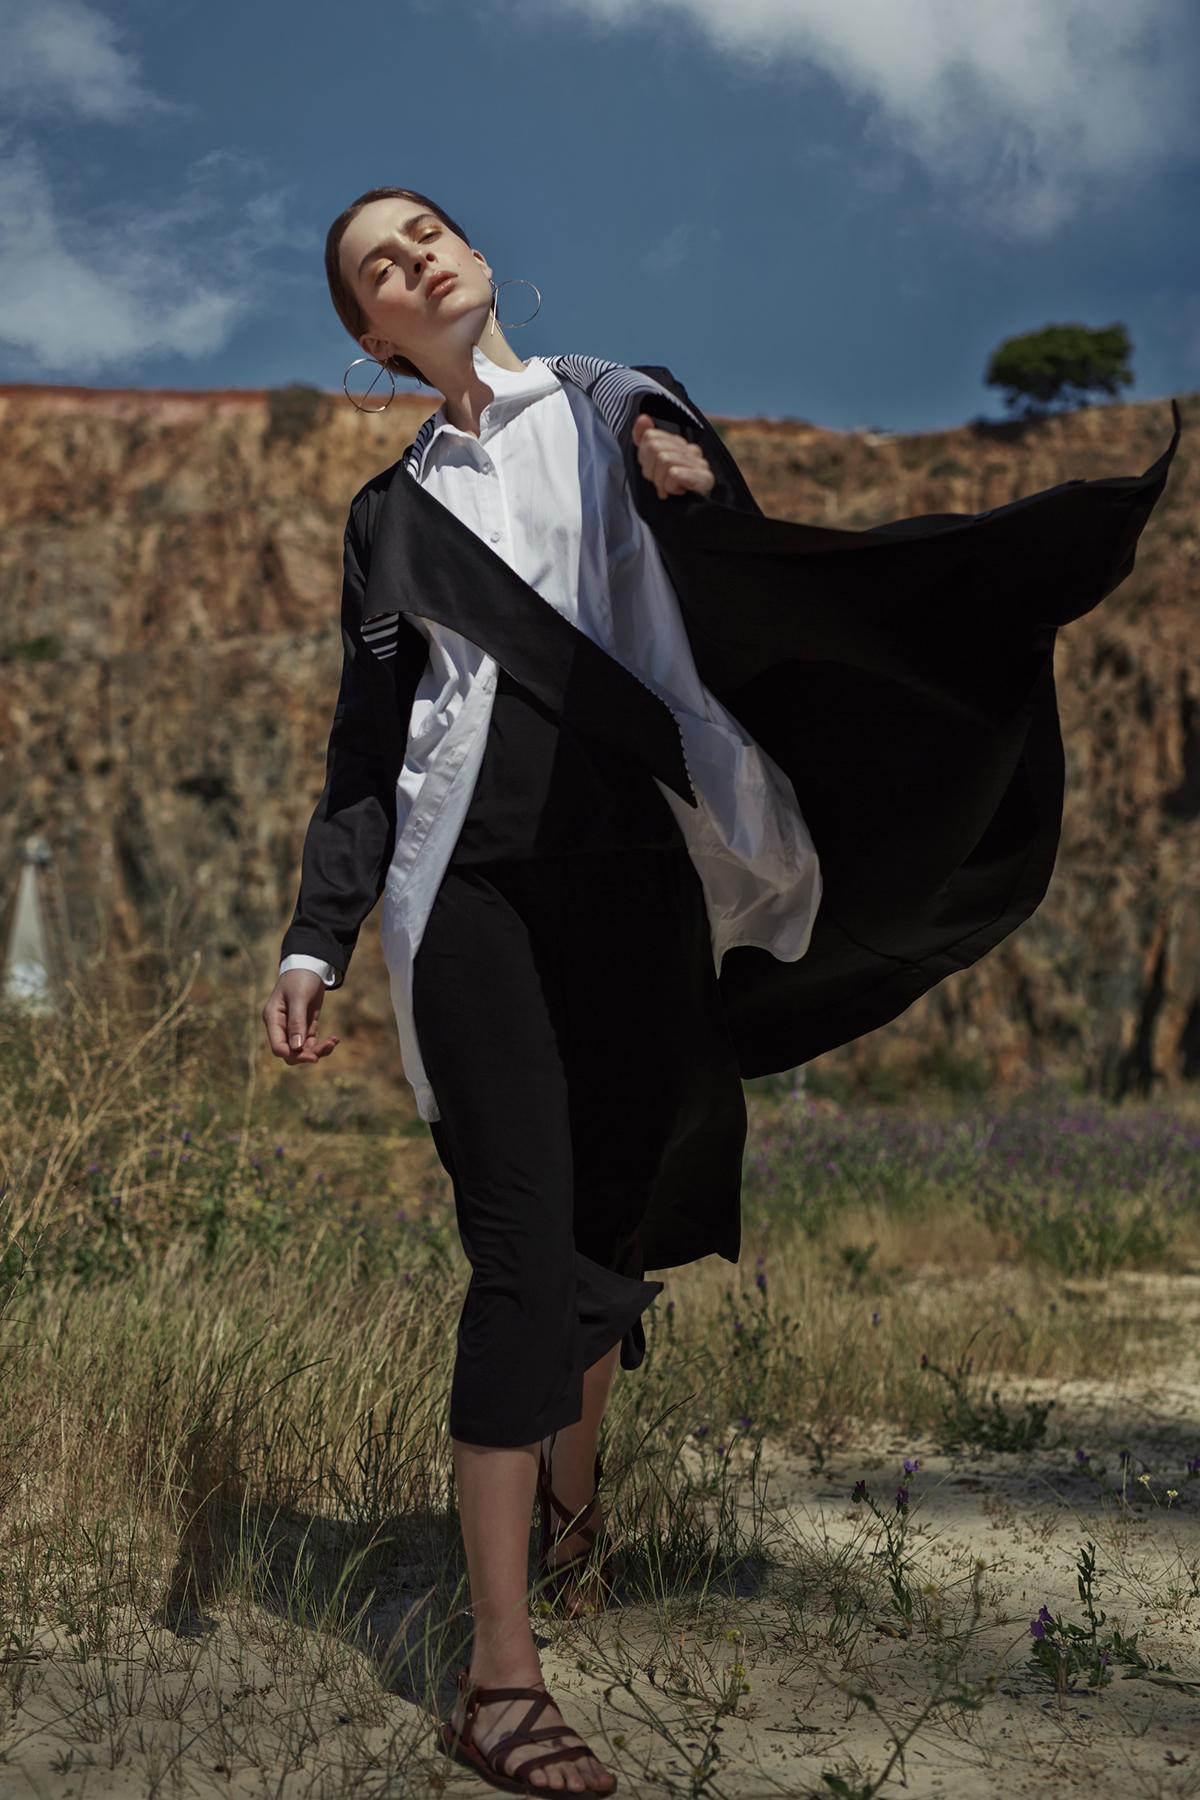 White shirt,  Amanda Laird Cherry; b  lack jumpsuit, Isabel de Villiers; black-and-white coat, Leigh Schubert;  gold hoop earrings, stylist's own